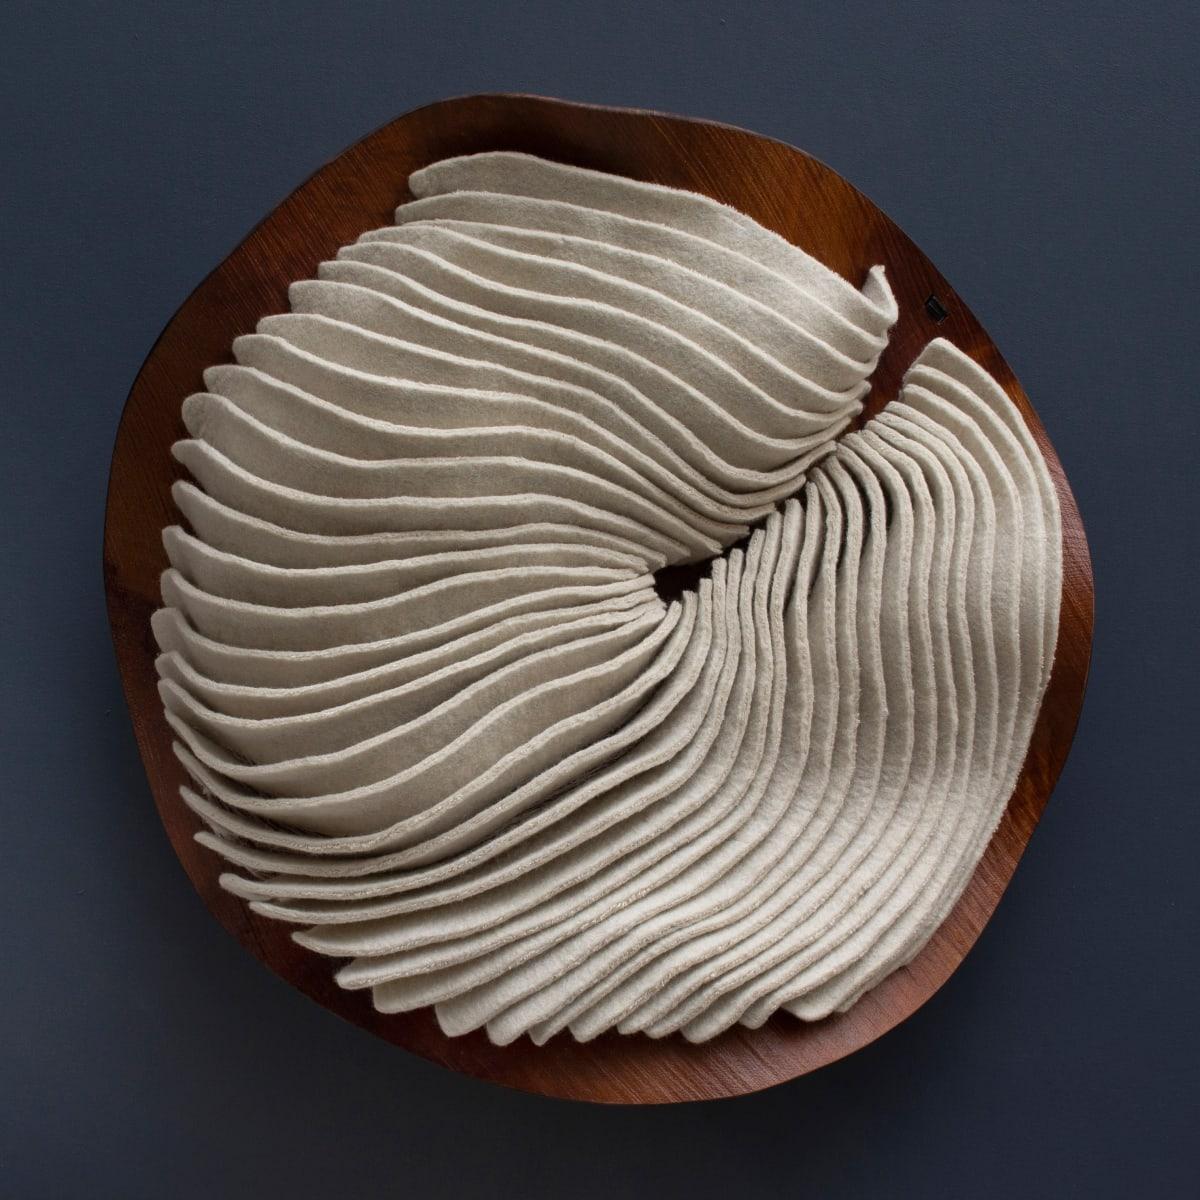 Fossil no. 1 by Kristy Kún